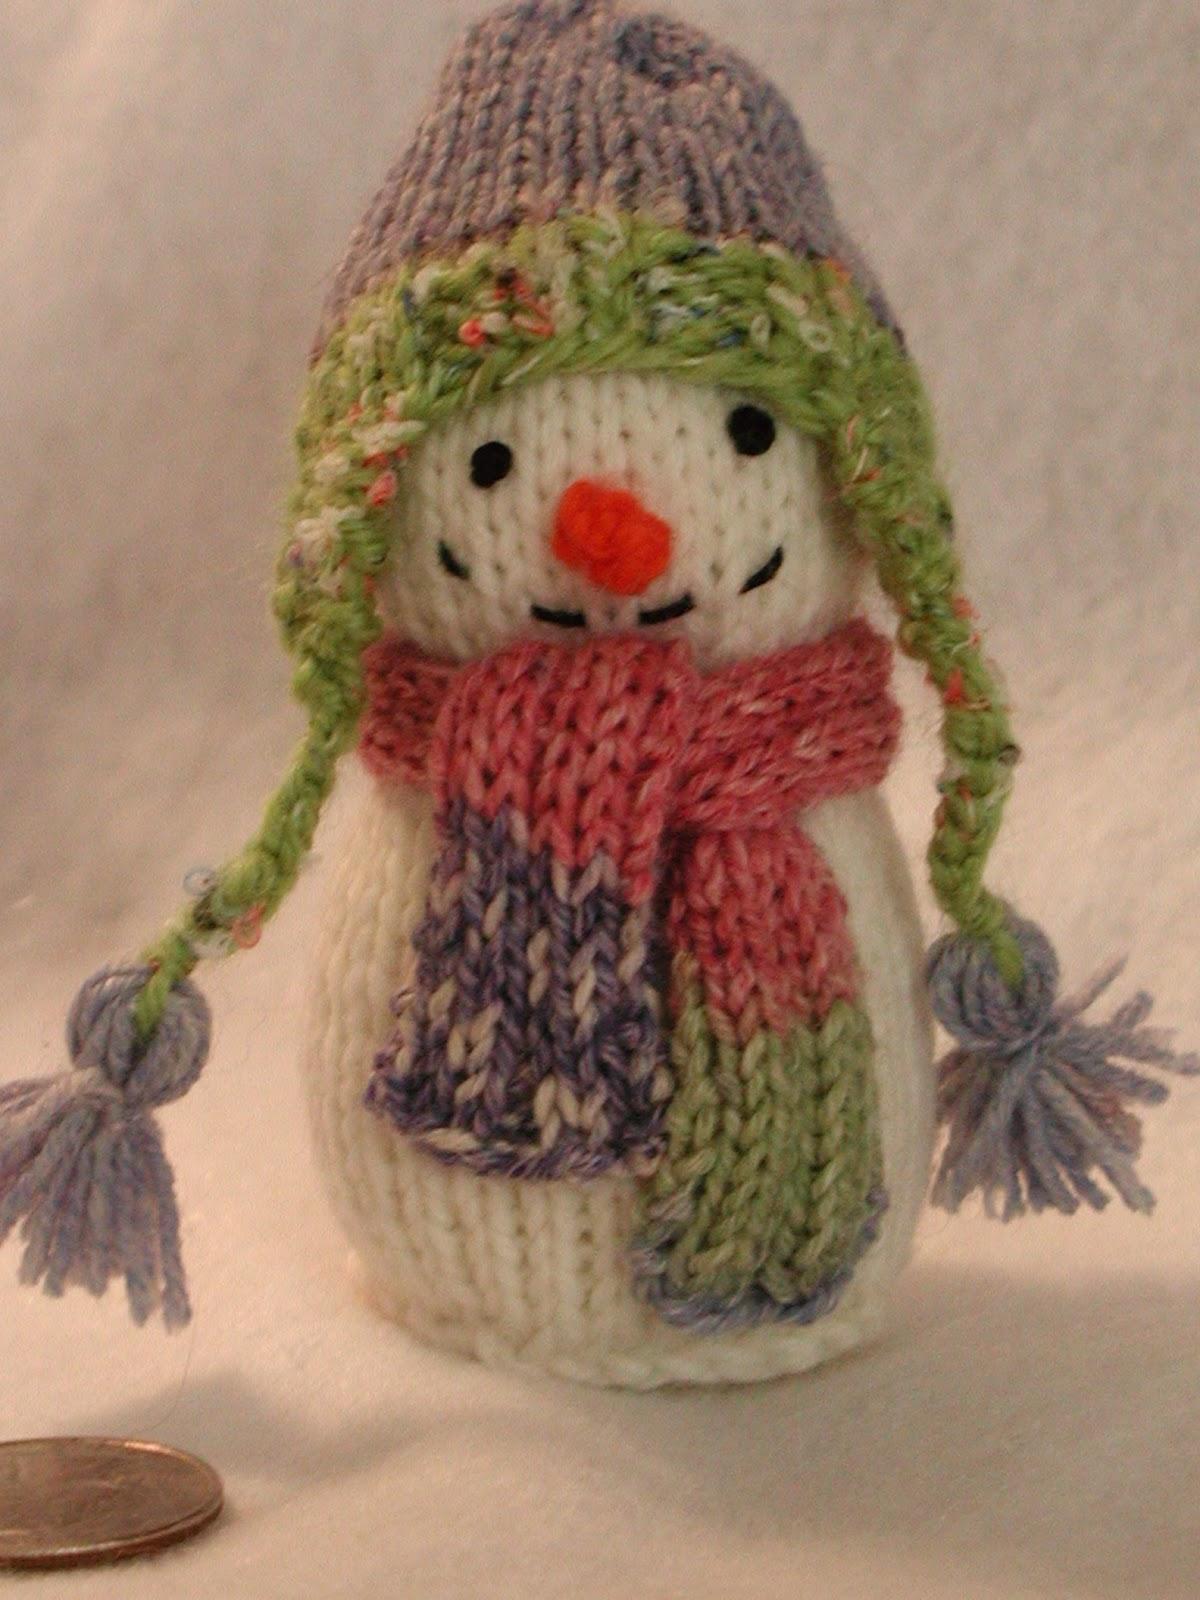 Fiddlesticks - My crochet and knitting ramblings.: More Snowman Love!